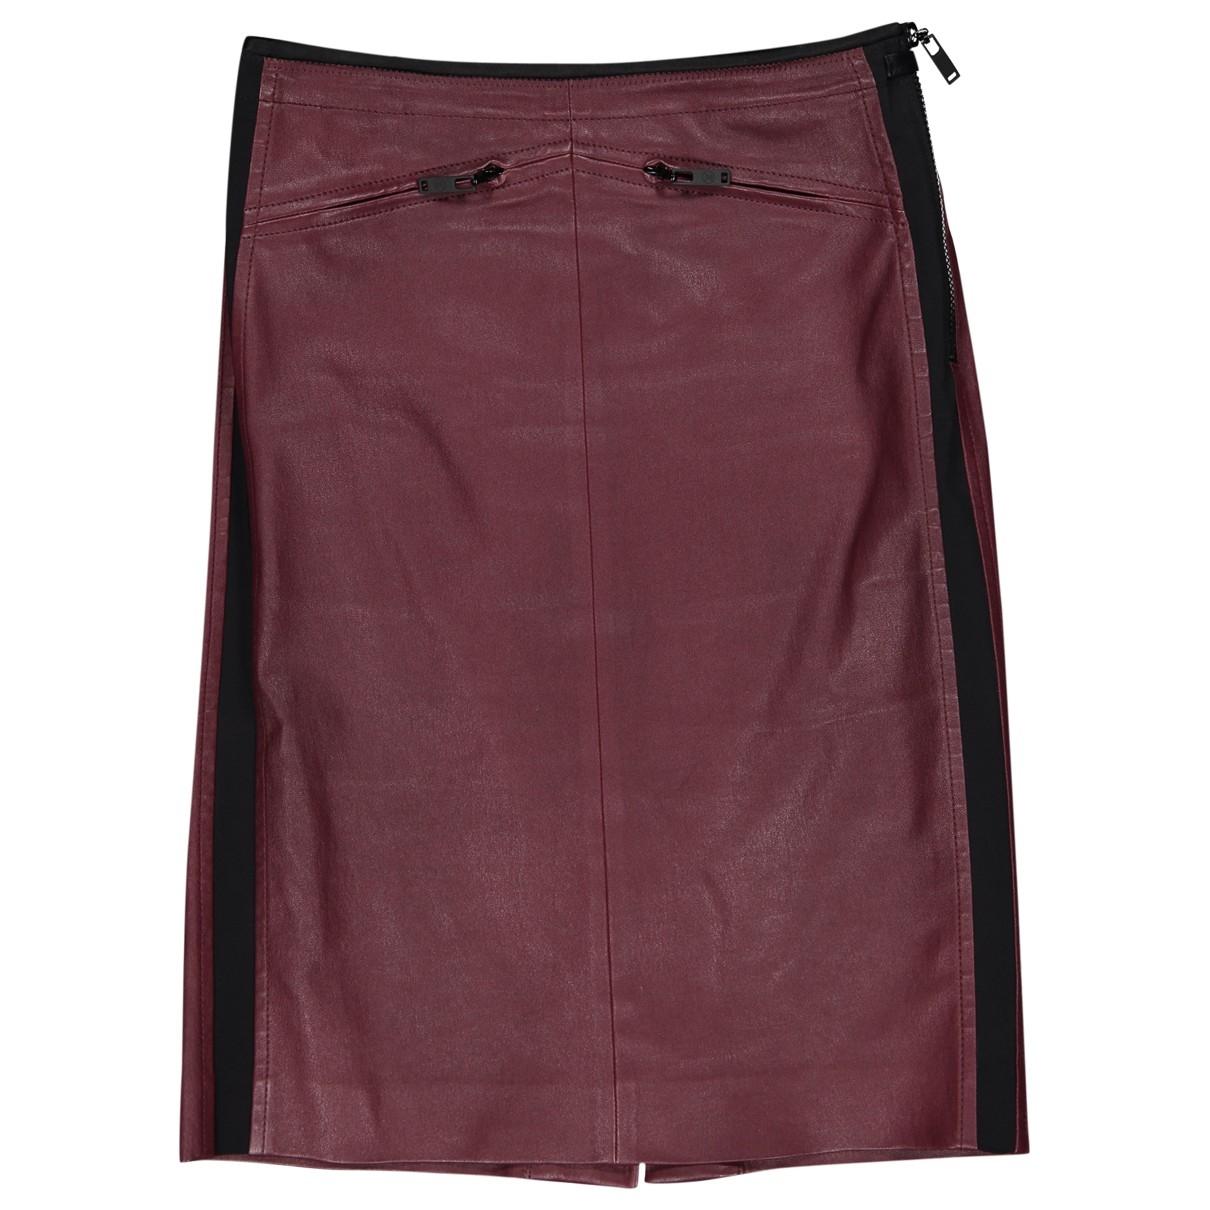 Louis Vuitton \N Burgundy Leather skirt for Women 38 FR